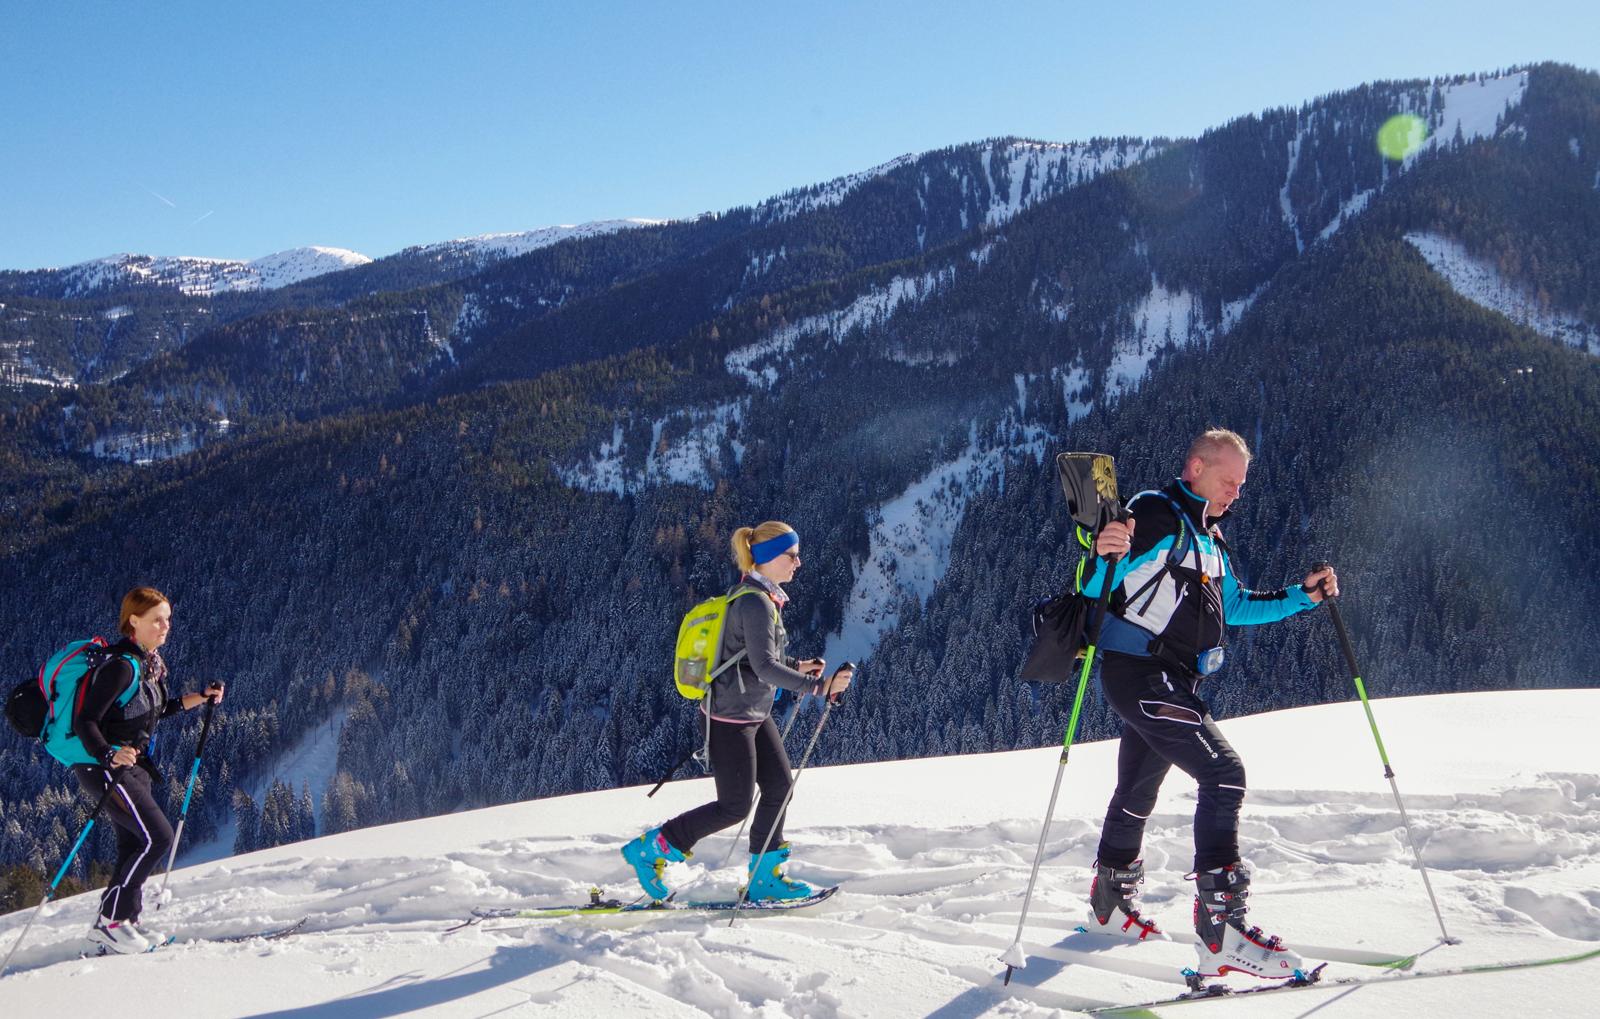 skifahren-oberaudorf-bg11626173730